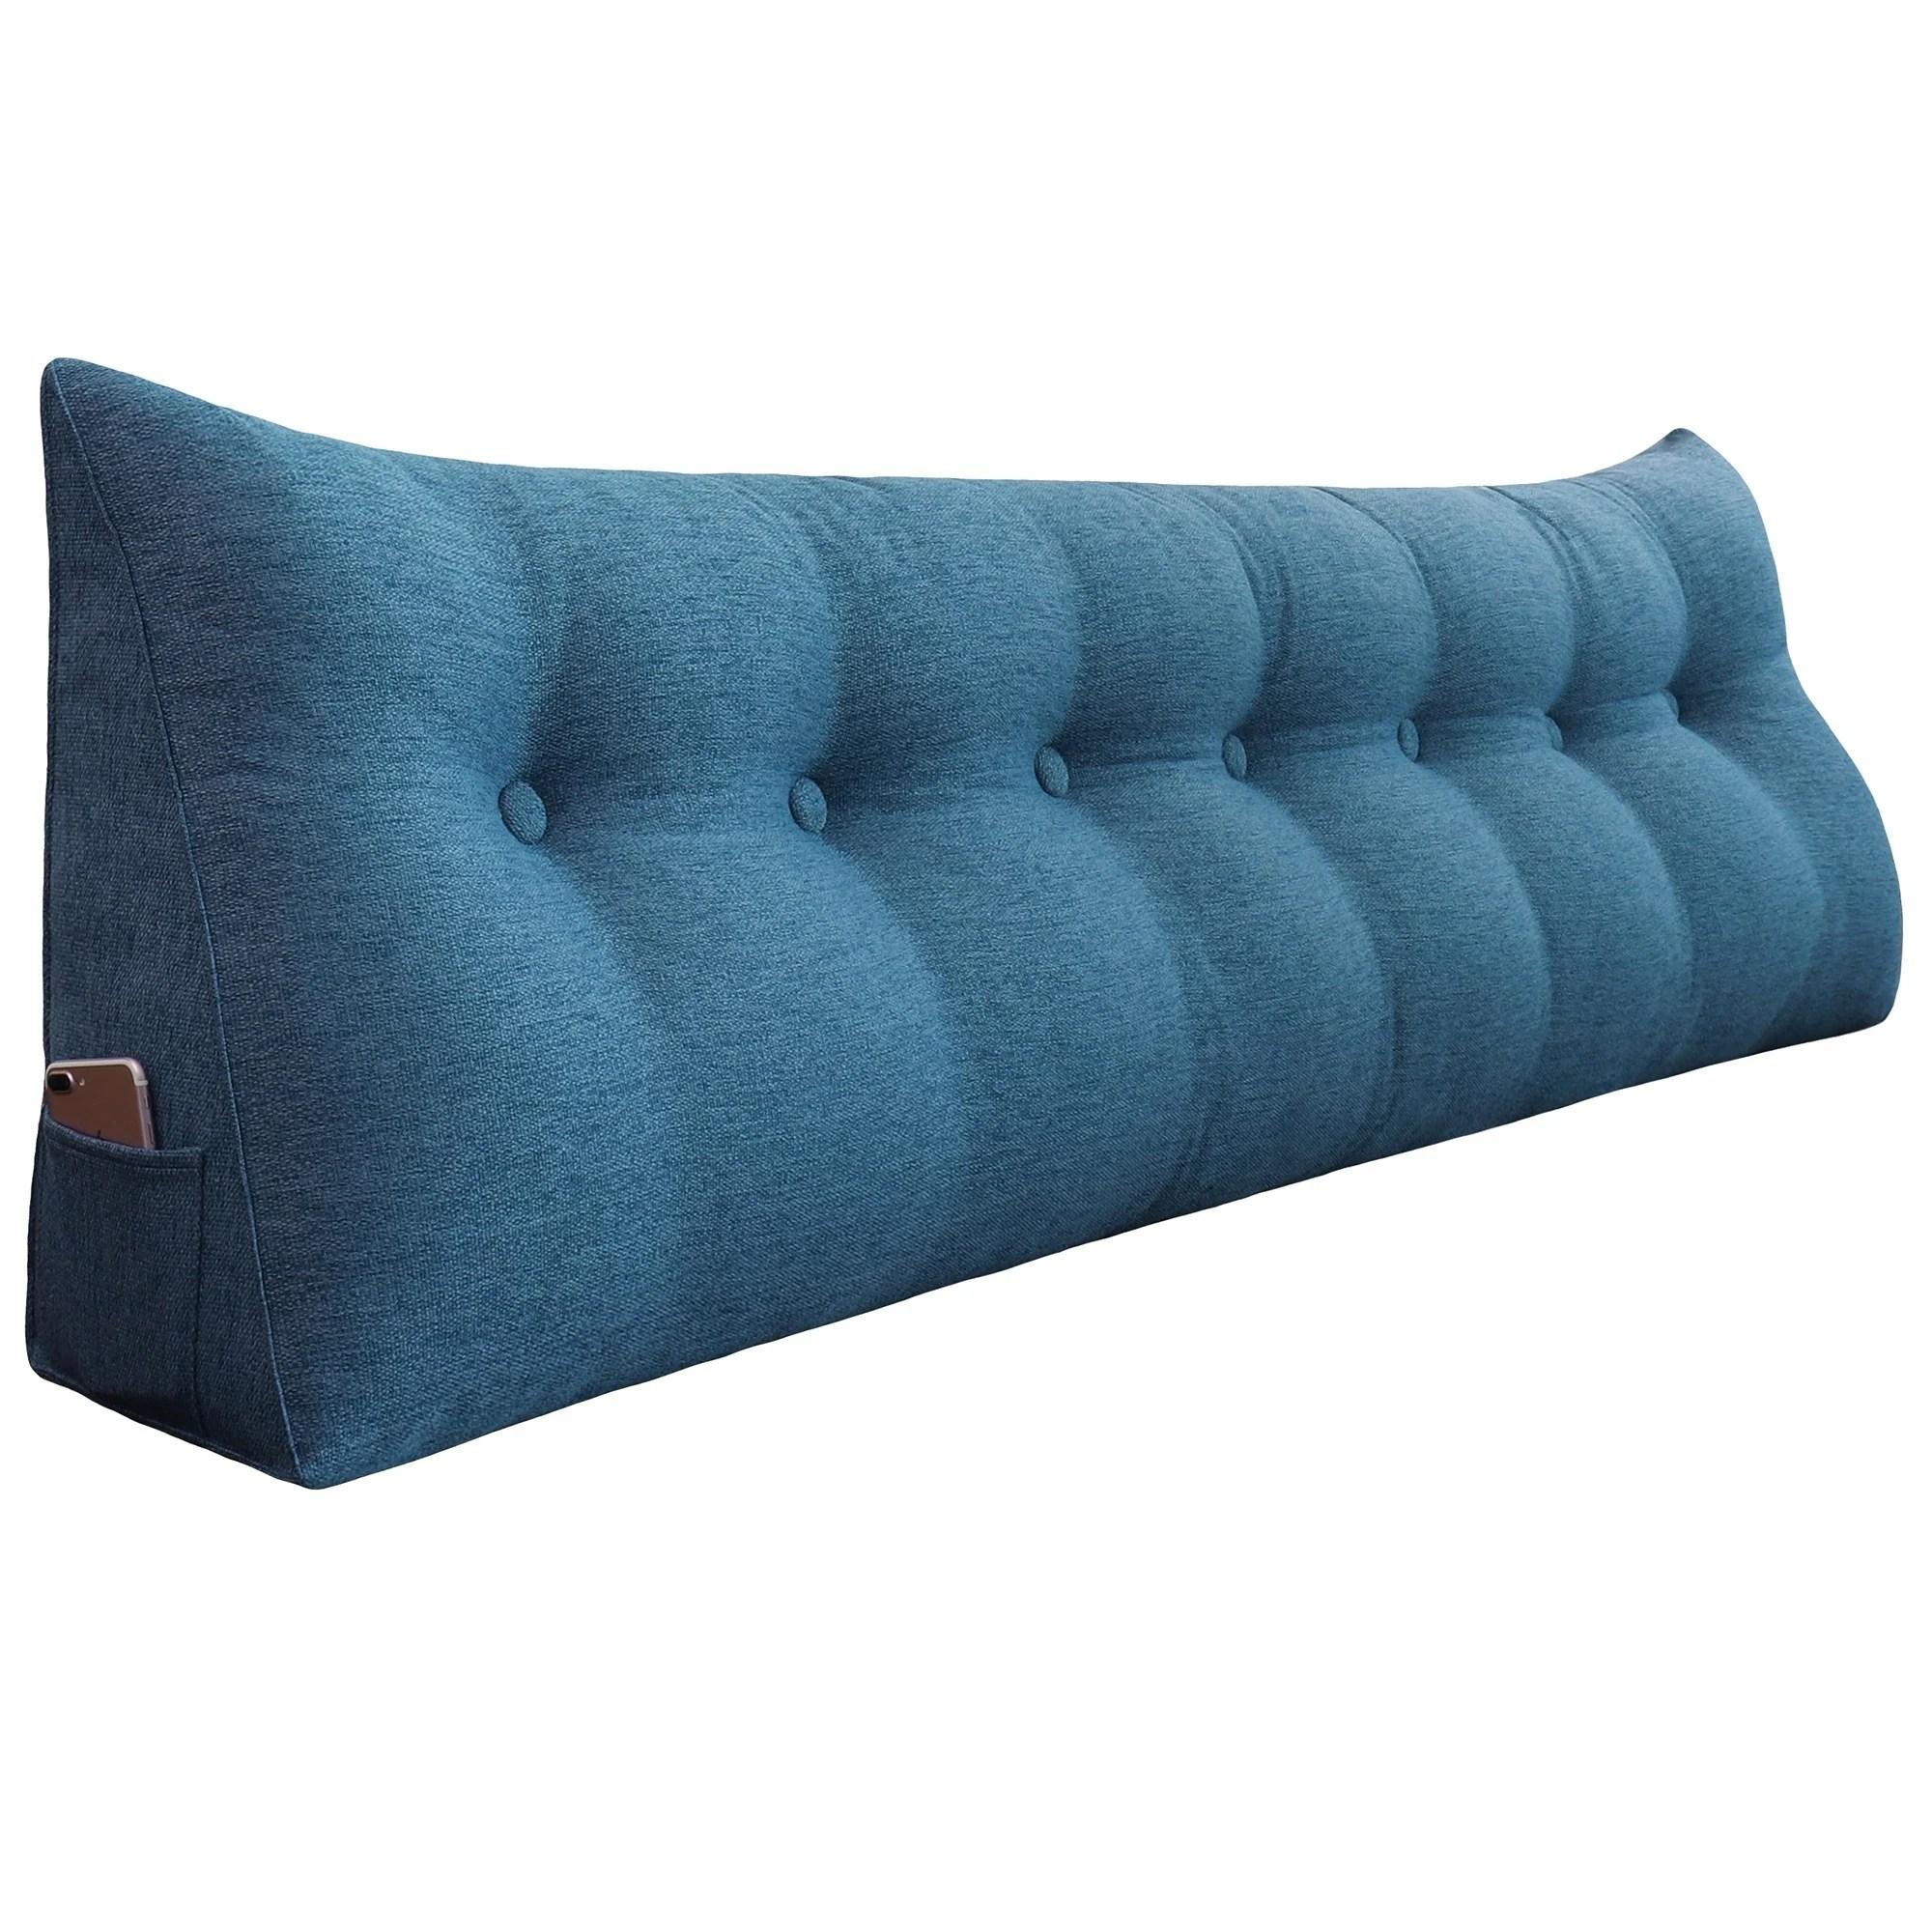 Shop Wowmax Bed Rest Wedge Pillow Oversized Extra Long Back Lumbar Pillow Overstock 30994608